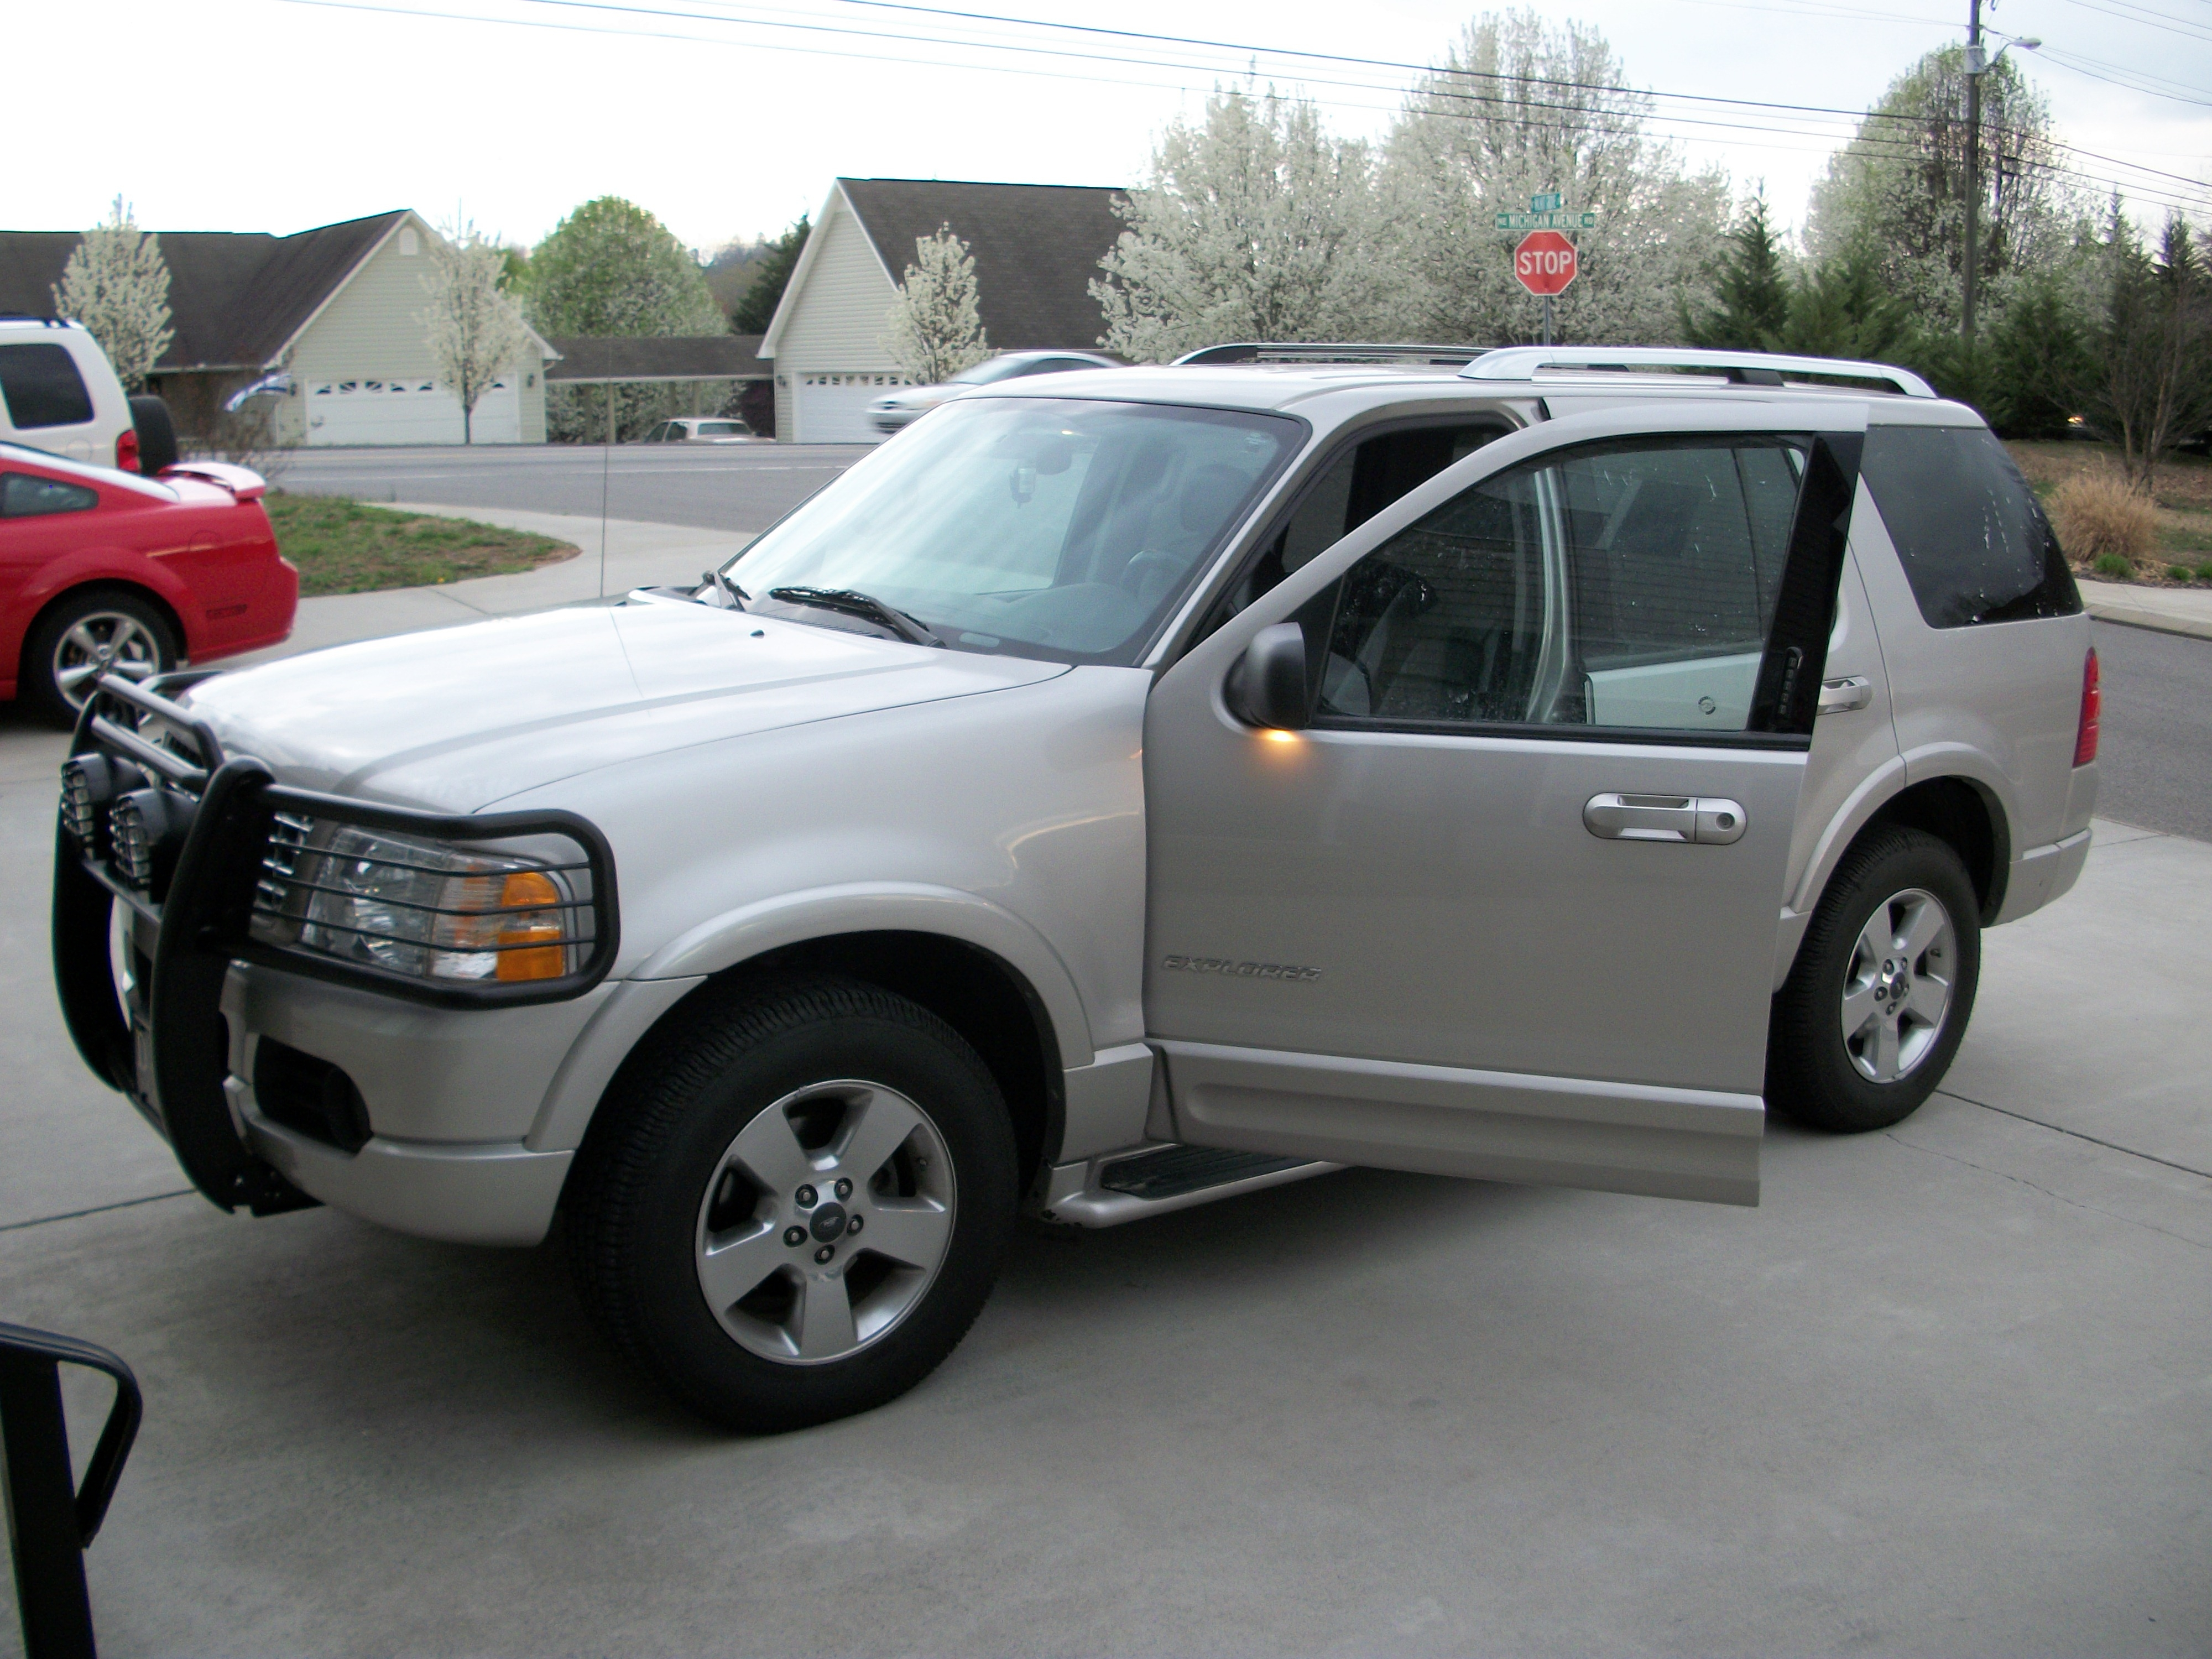 2004 ford explorer - image #5